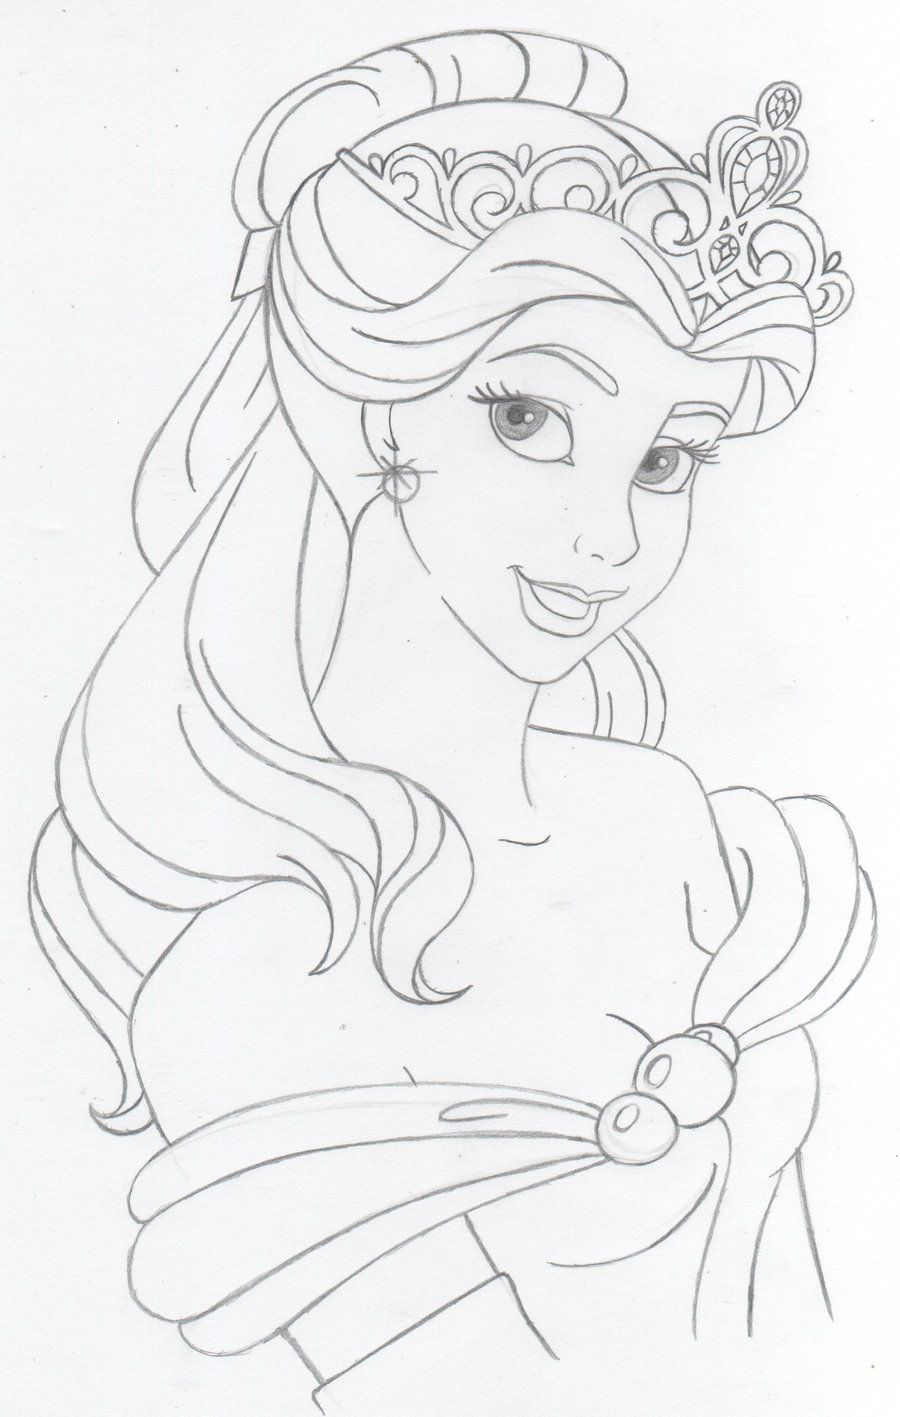 Disney's Belle by katebushfanatic Princess drawings